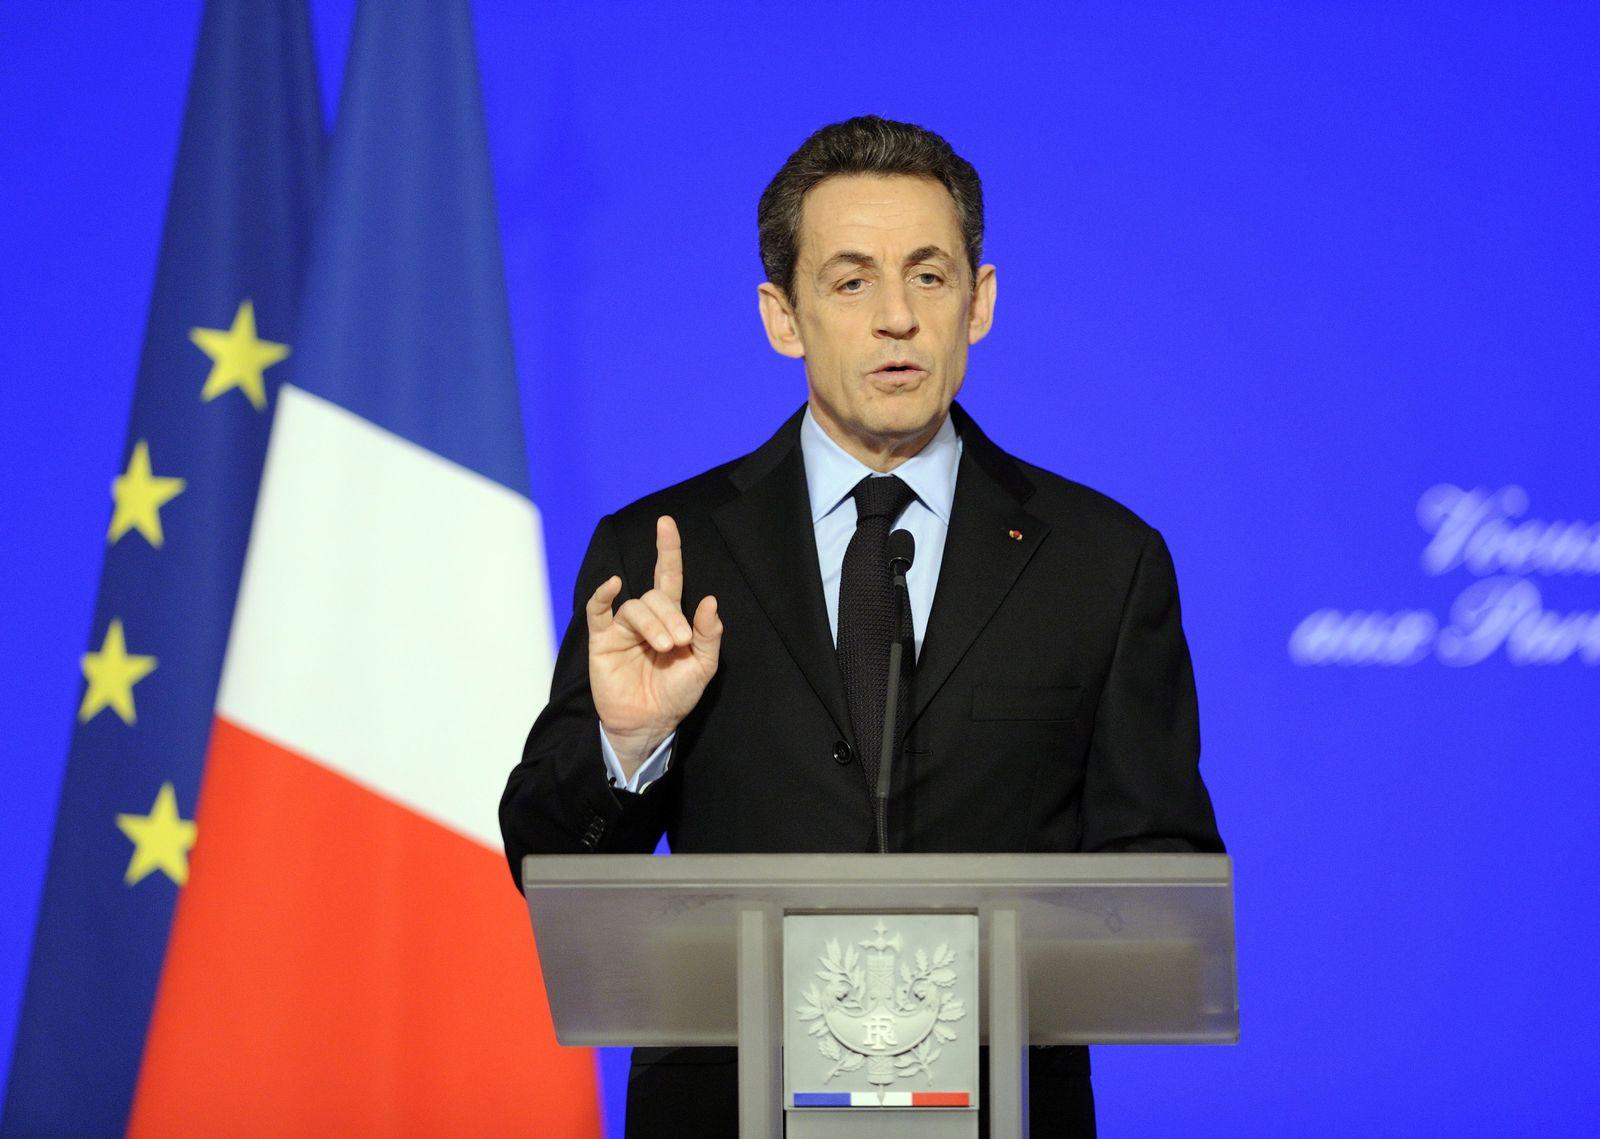 Sarkozy / Neujahrswünsche